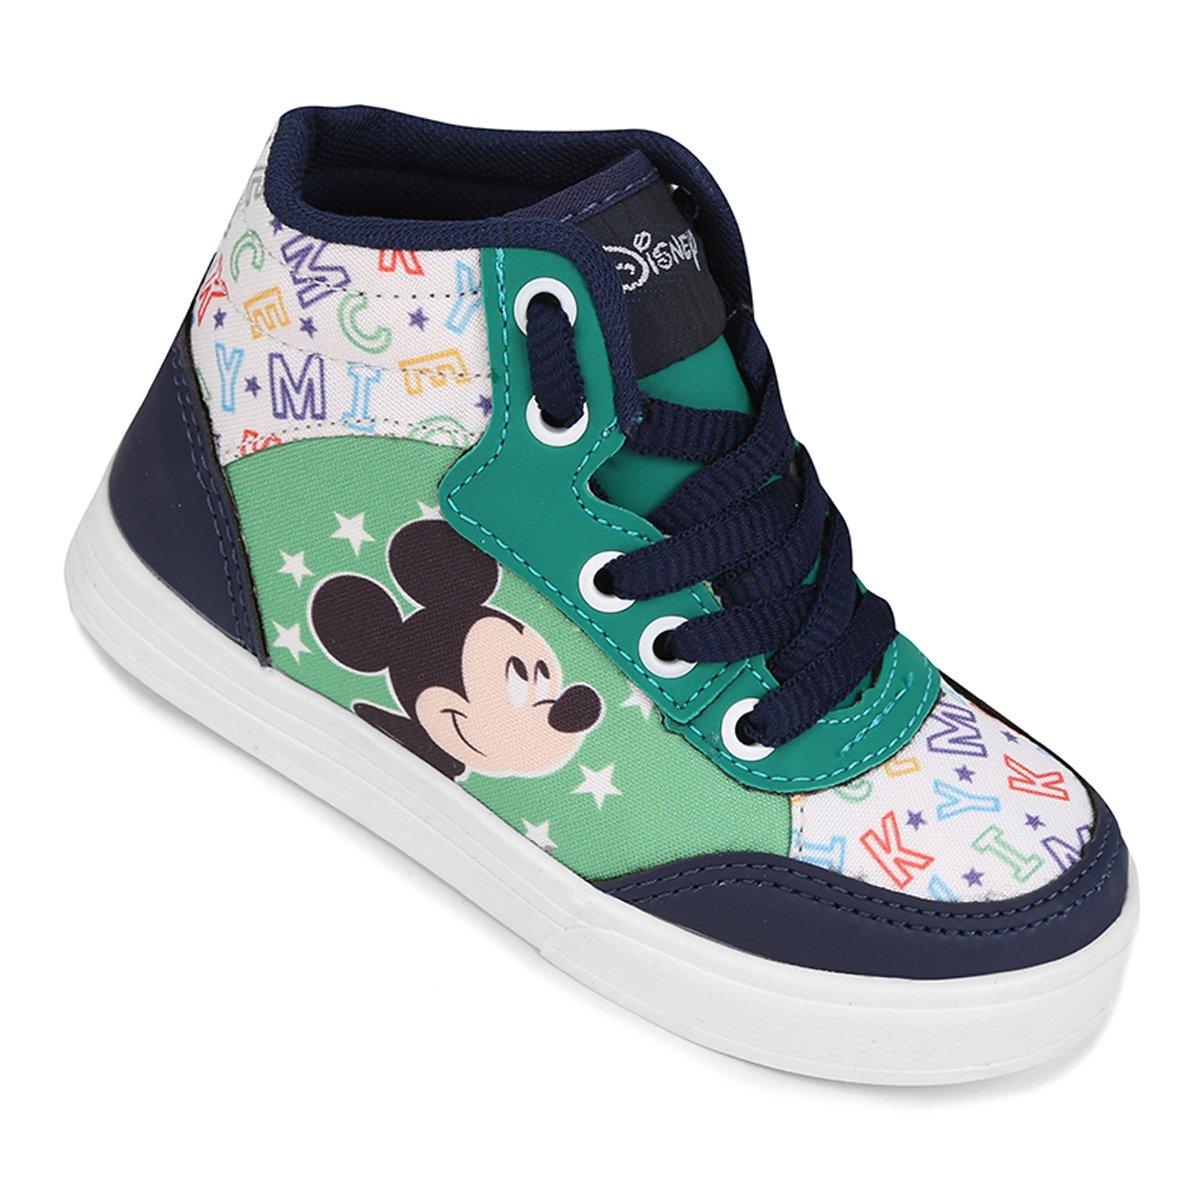 b0deffd804 Tênis Infantil Cano Alto Disney Mickey Masculino